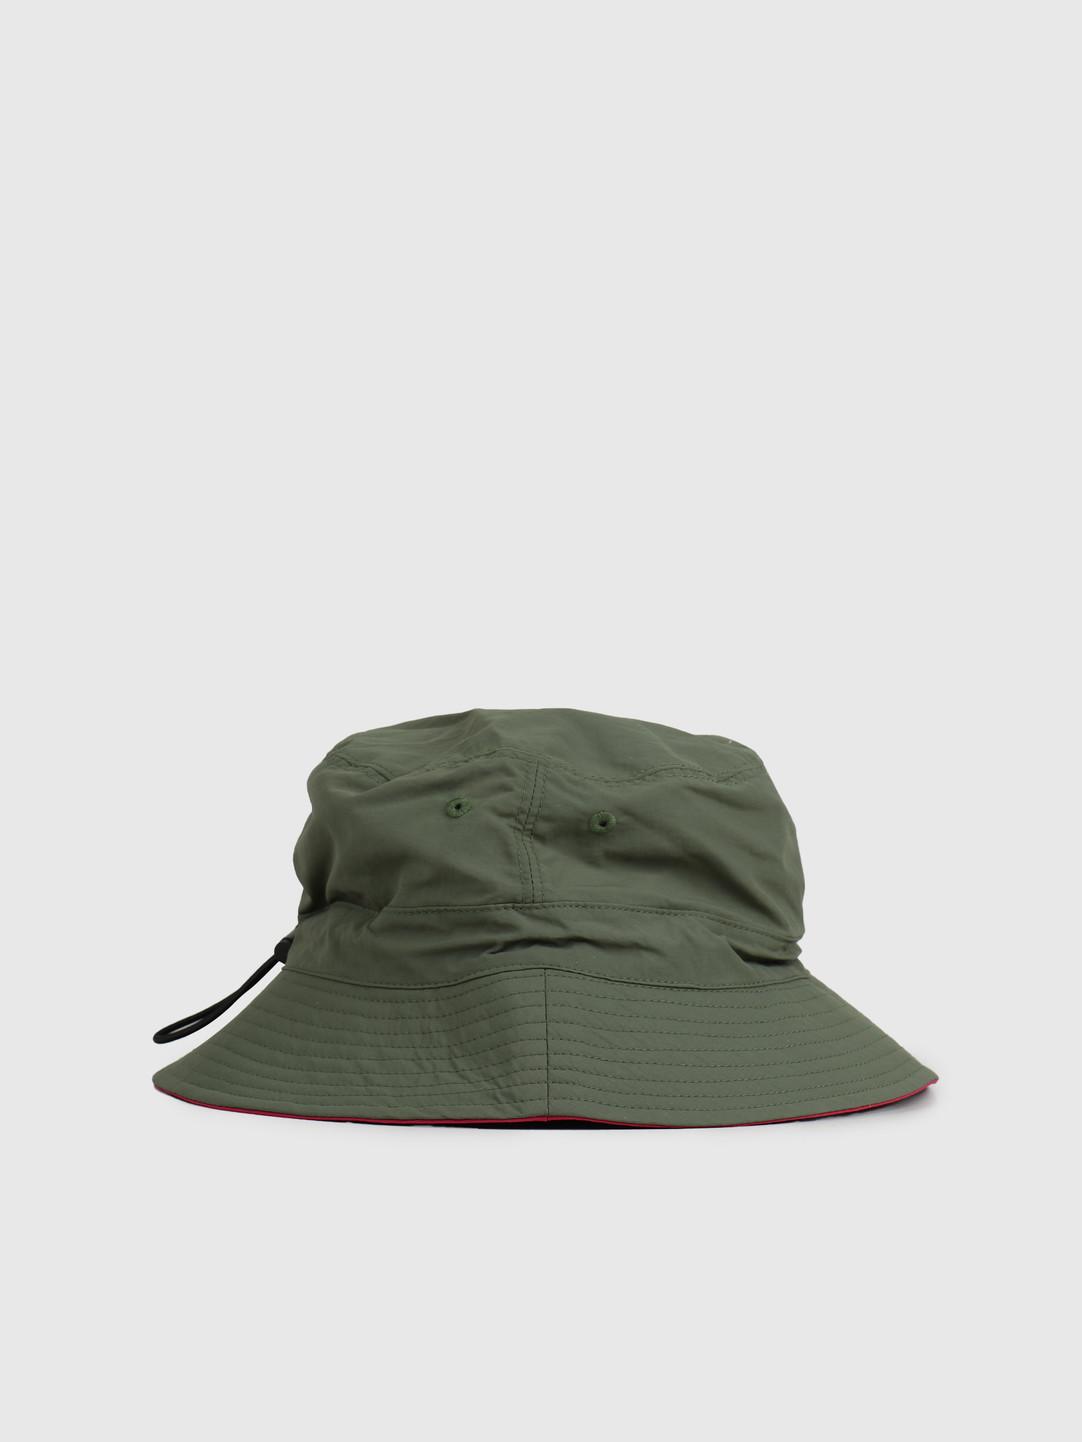 Gramicci Gramicci Shell Reversible Hat Olive Raspberry GAC-20S042